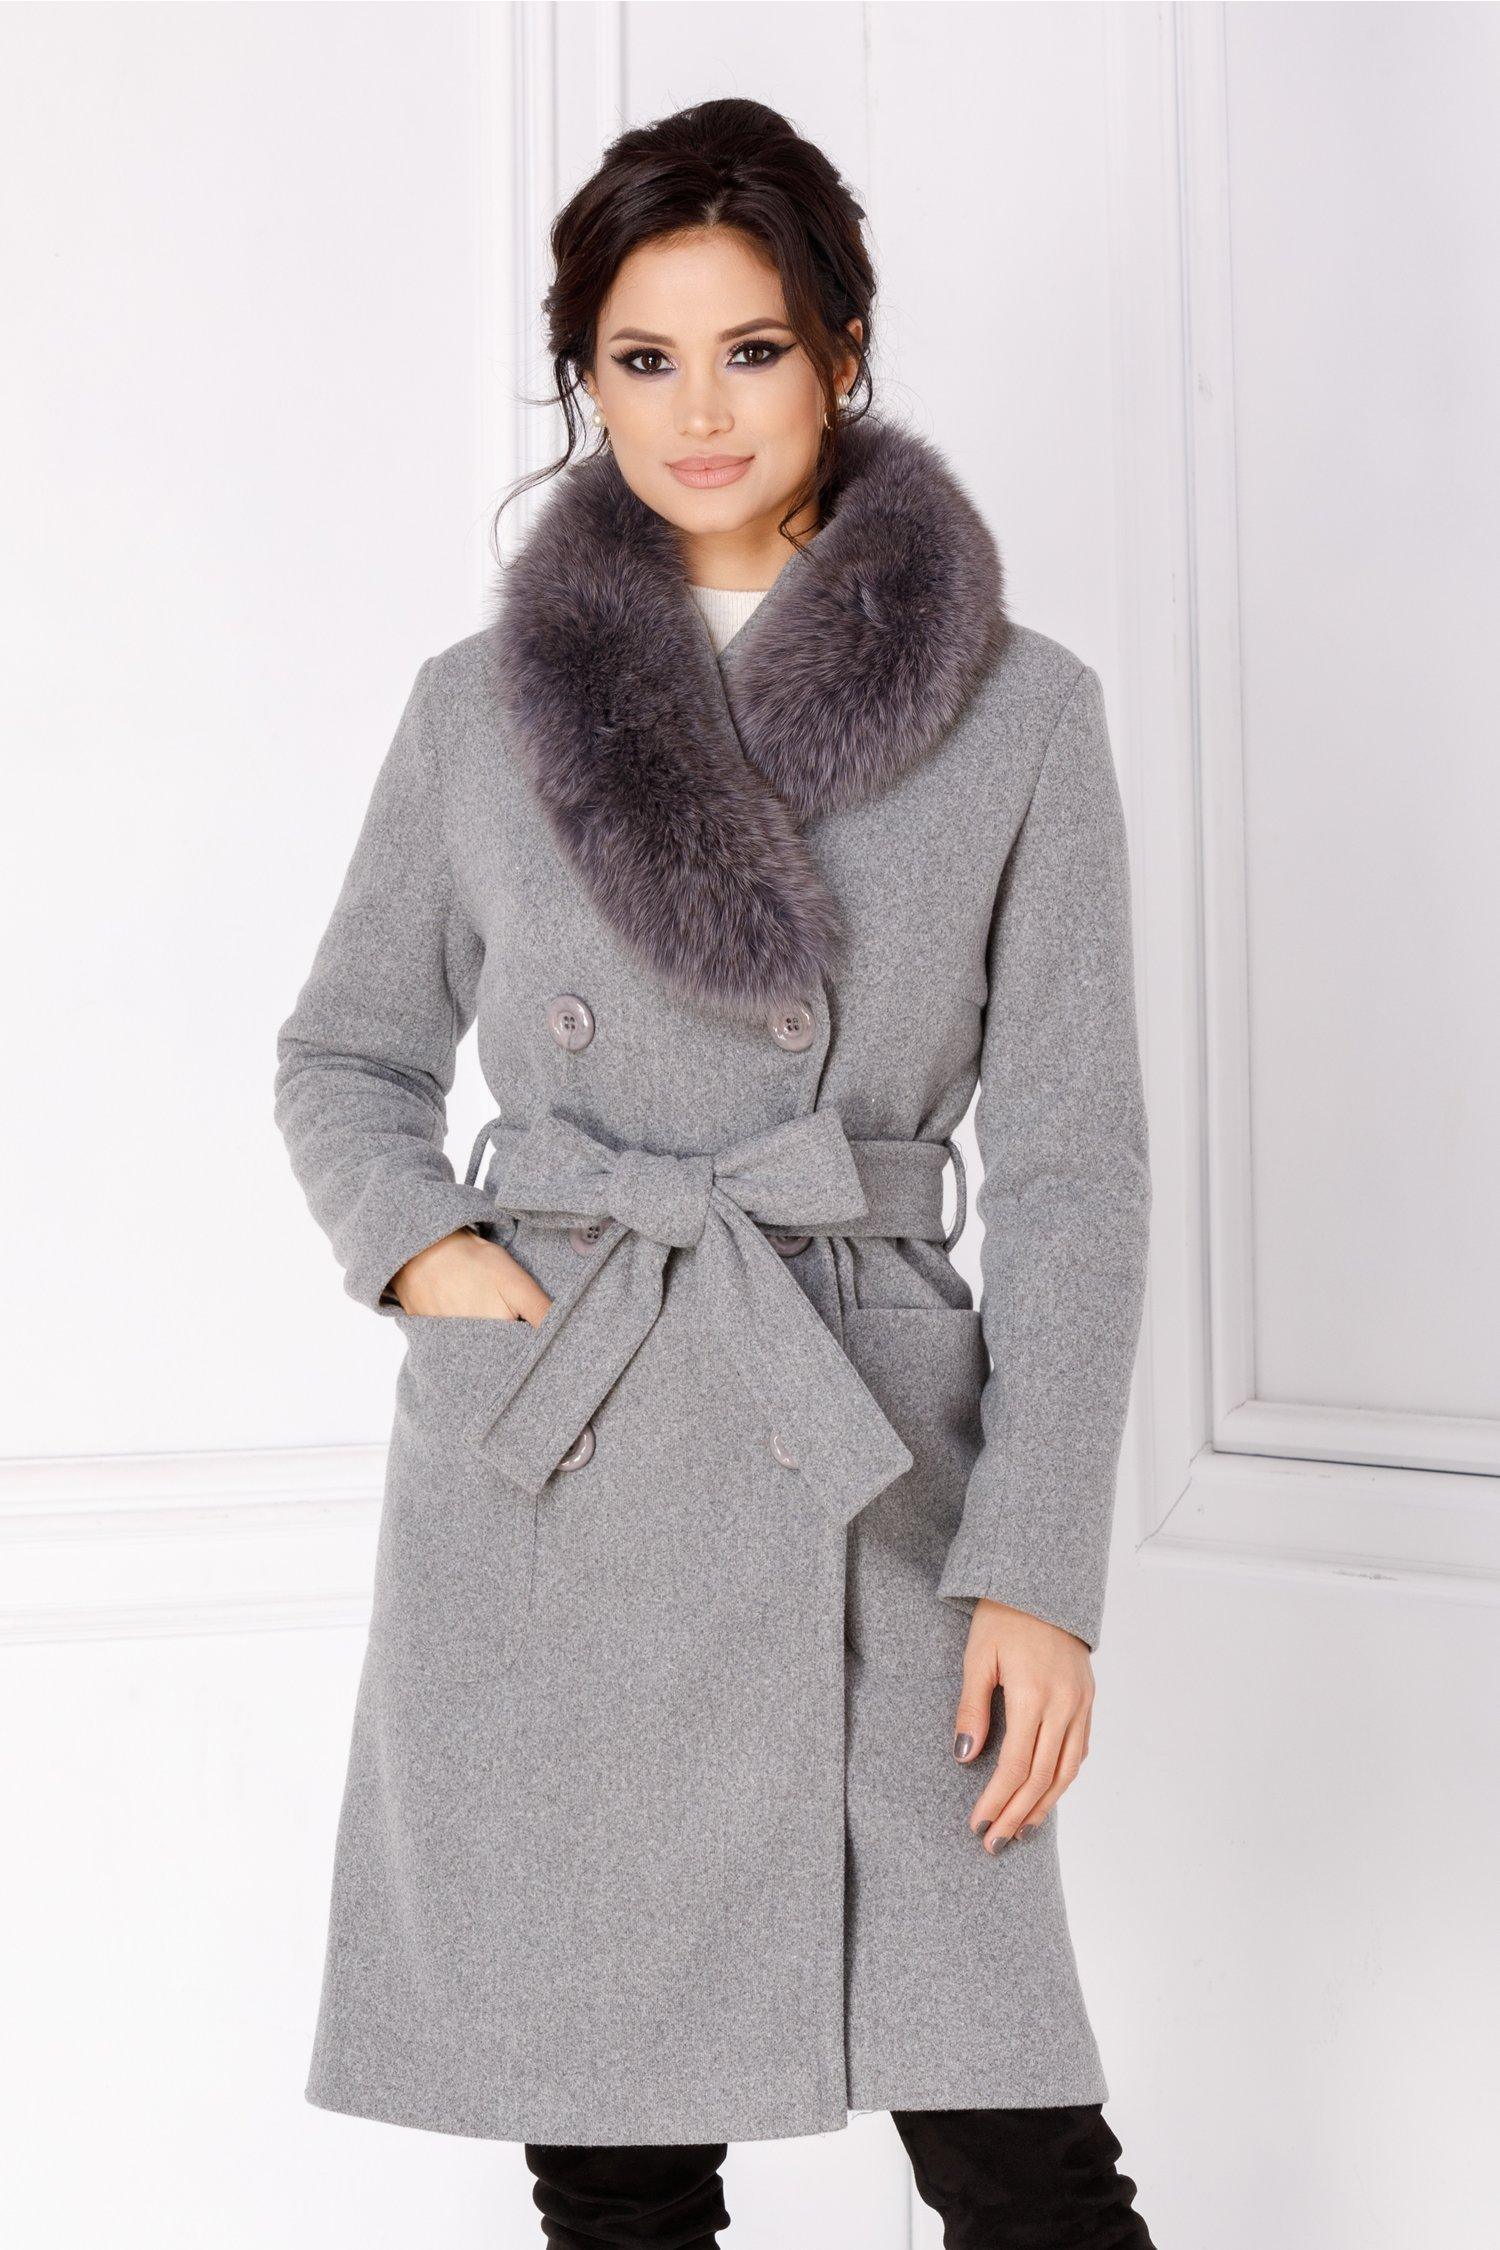 Palton LaDonna gri cu rever accesorizat cu blanita naturala